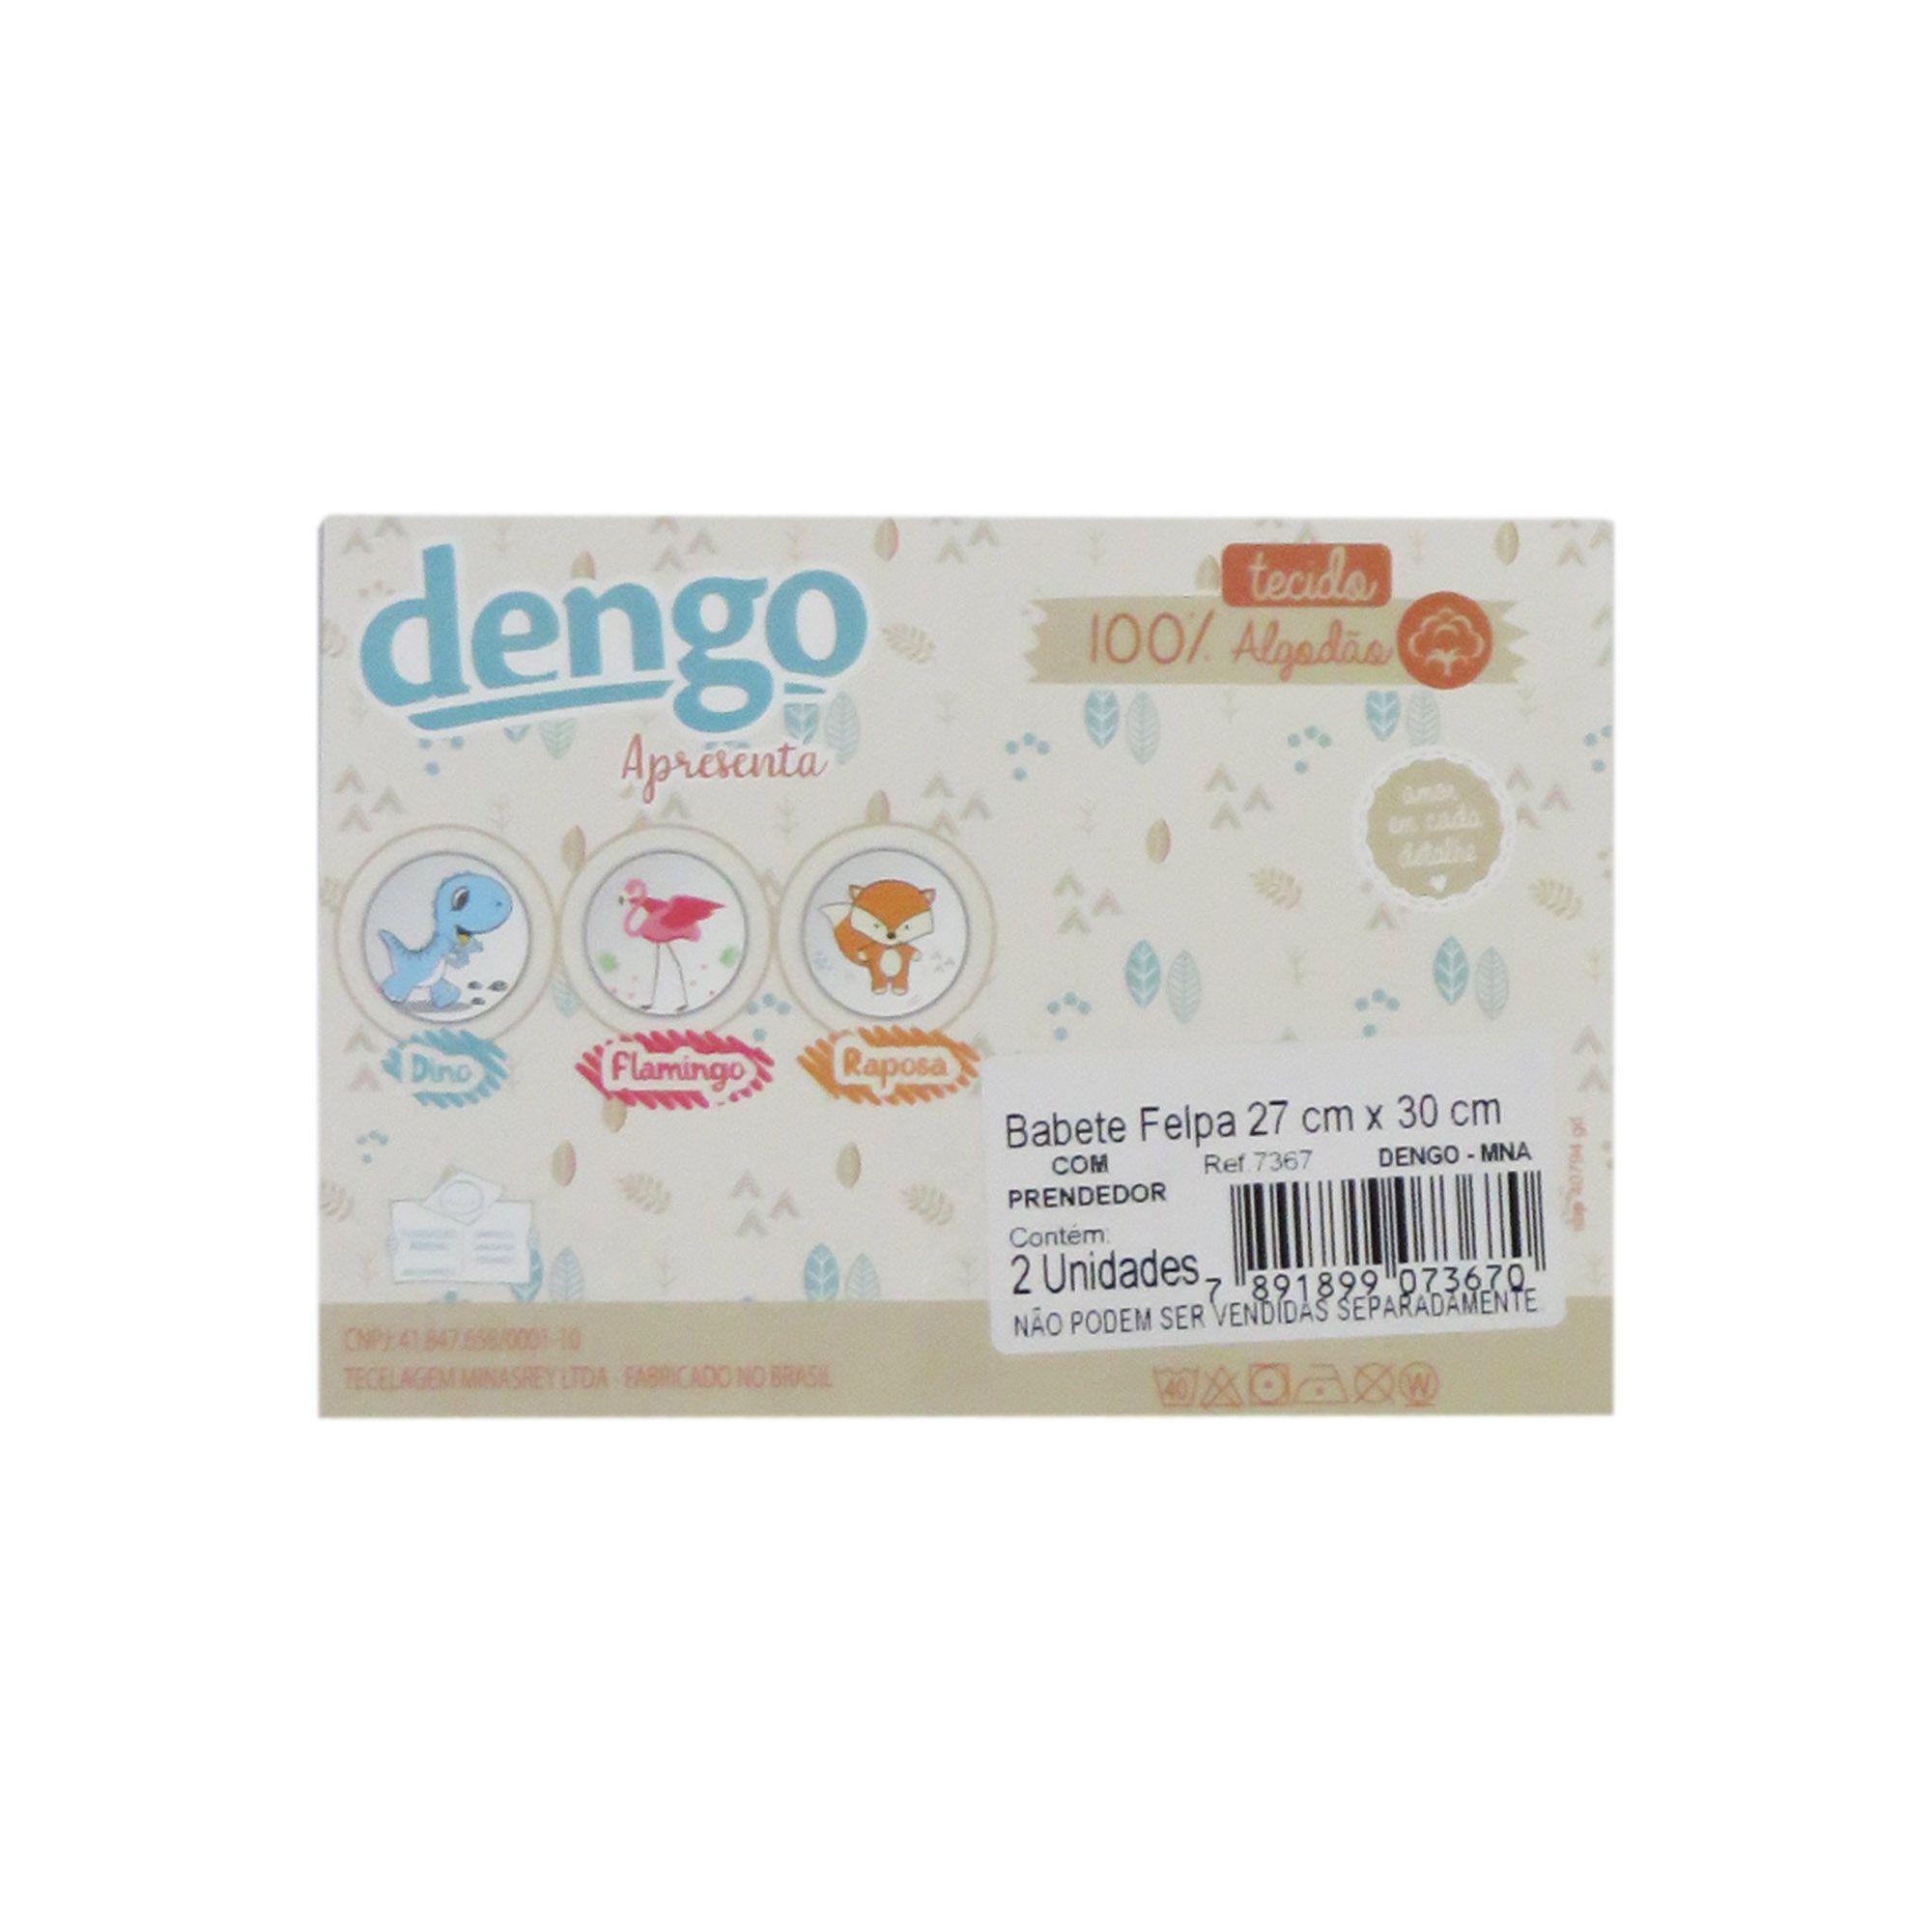 Babete felpa com Duas unidades - Minasrey - Dengo